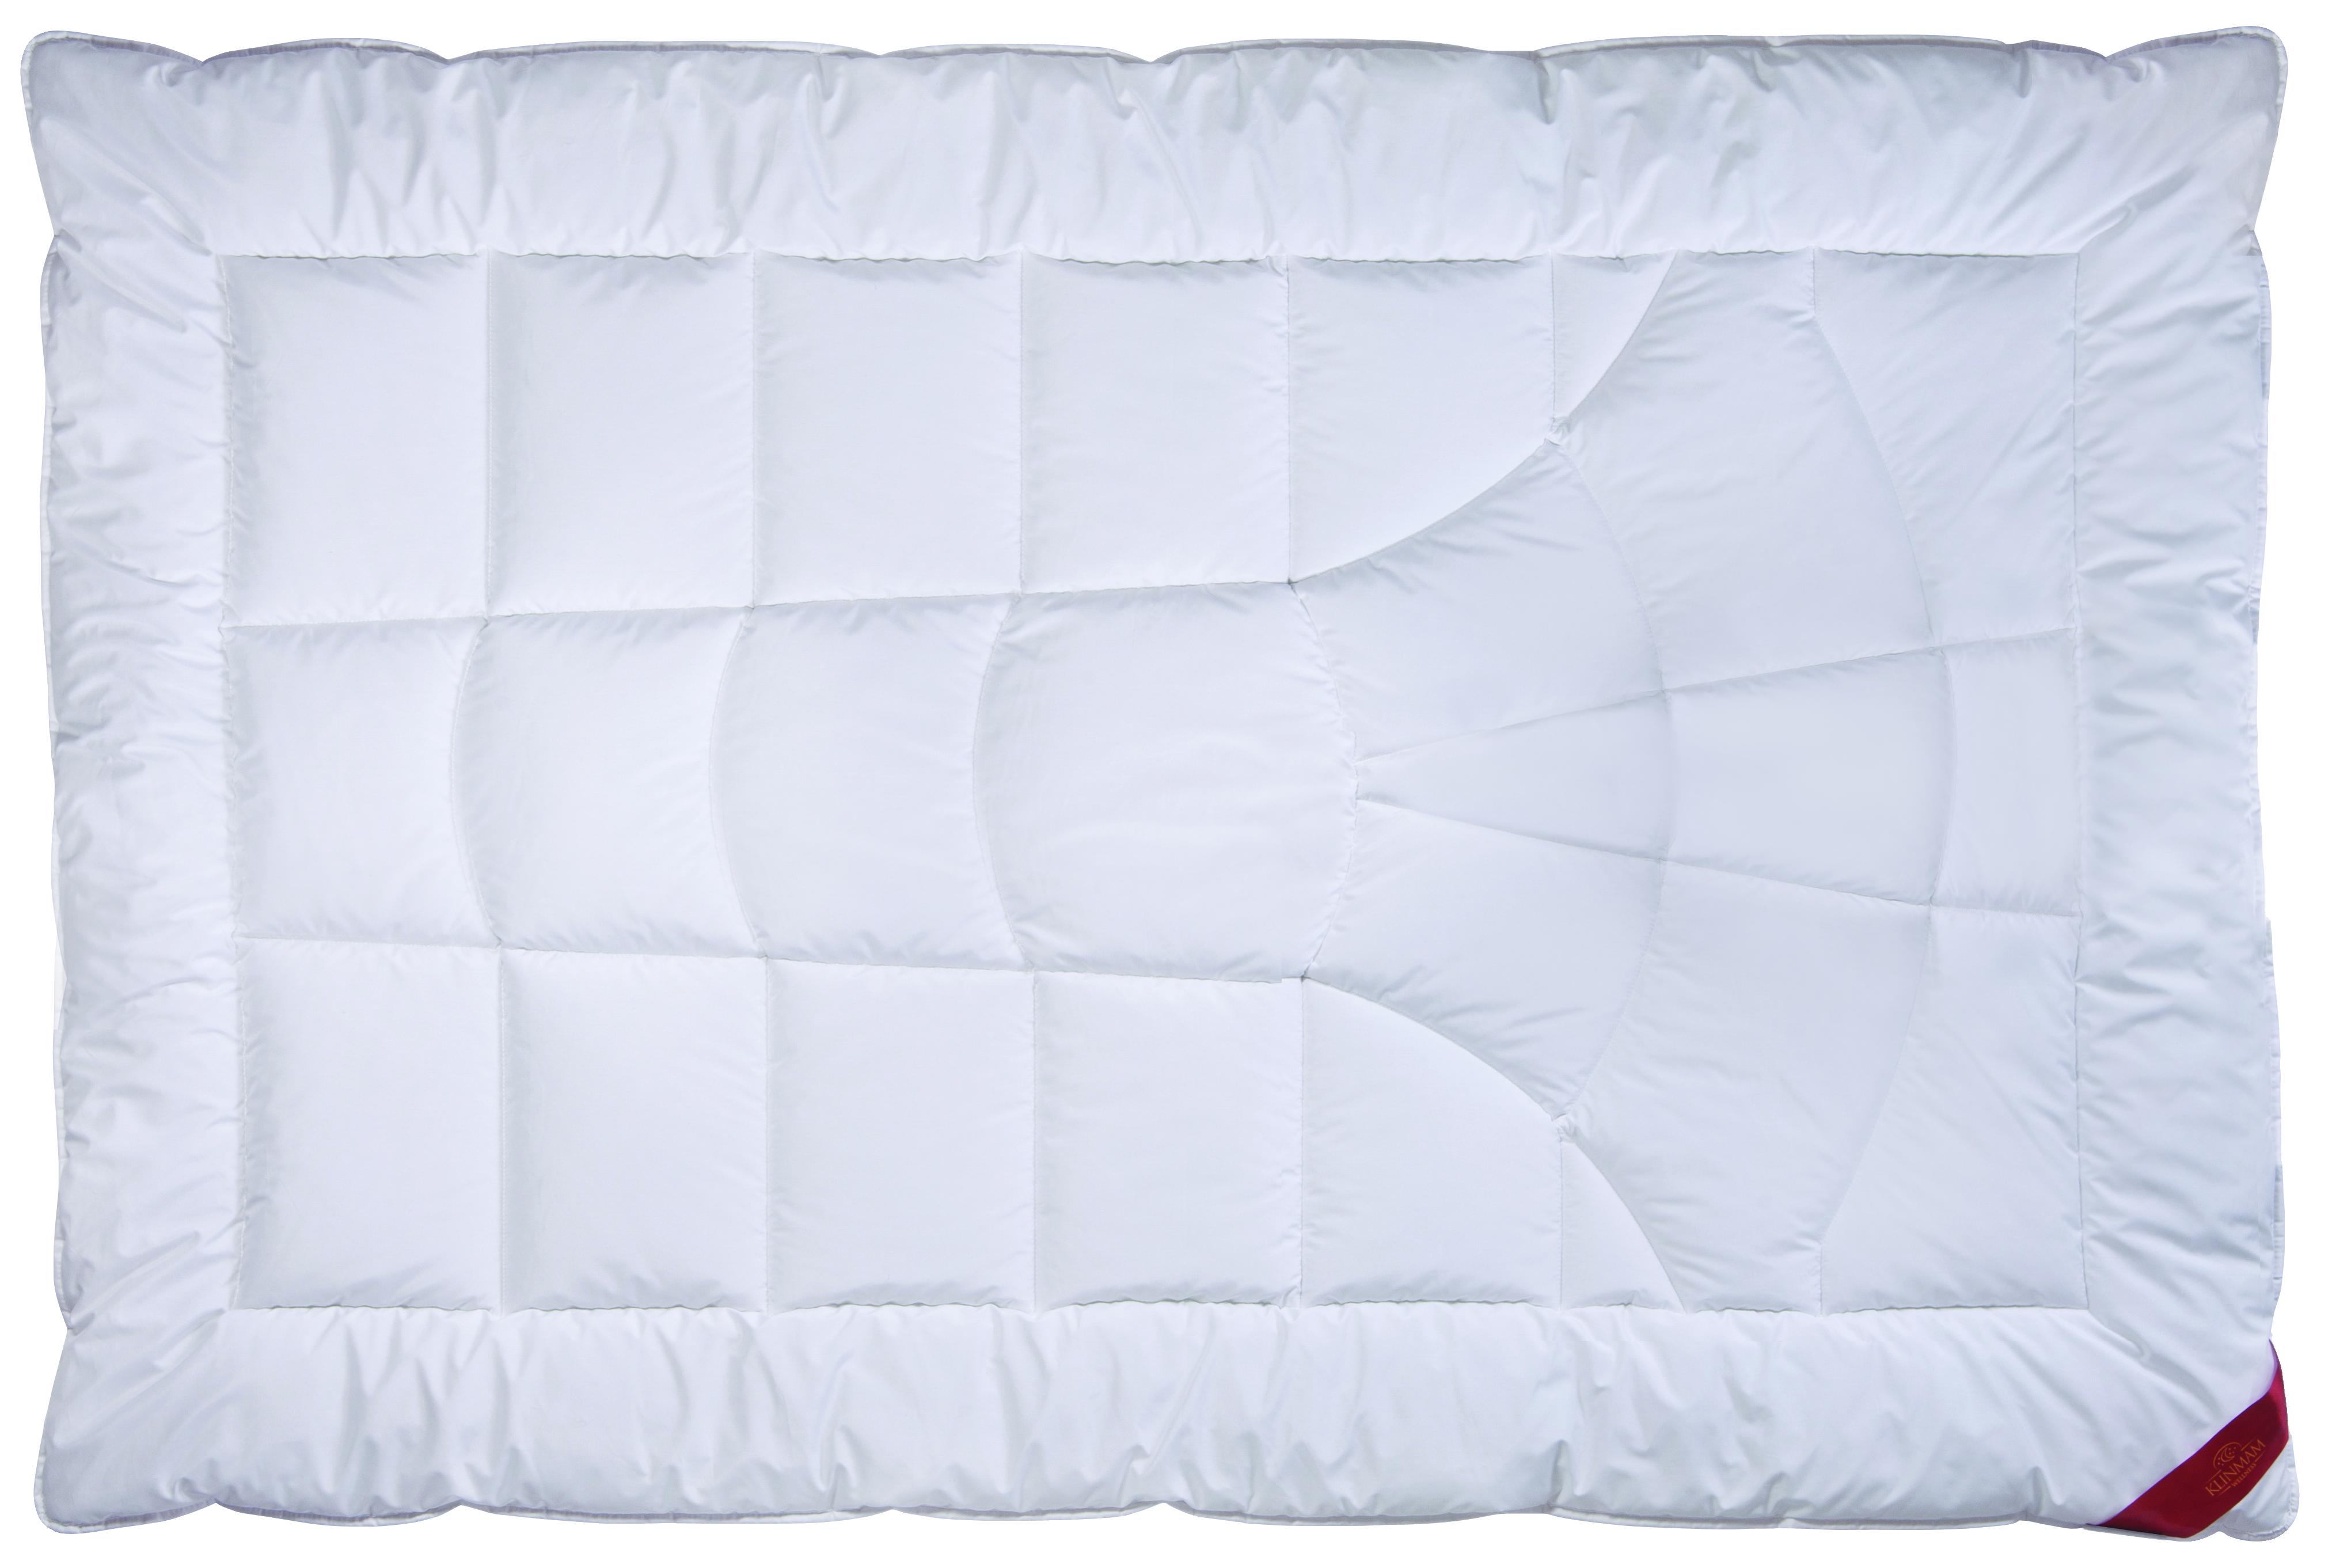 Modall Přikrývka - 135 x 200 cm - Klinmam